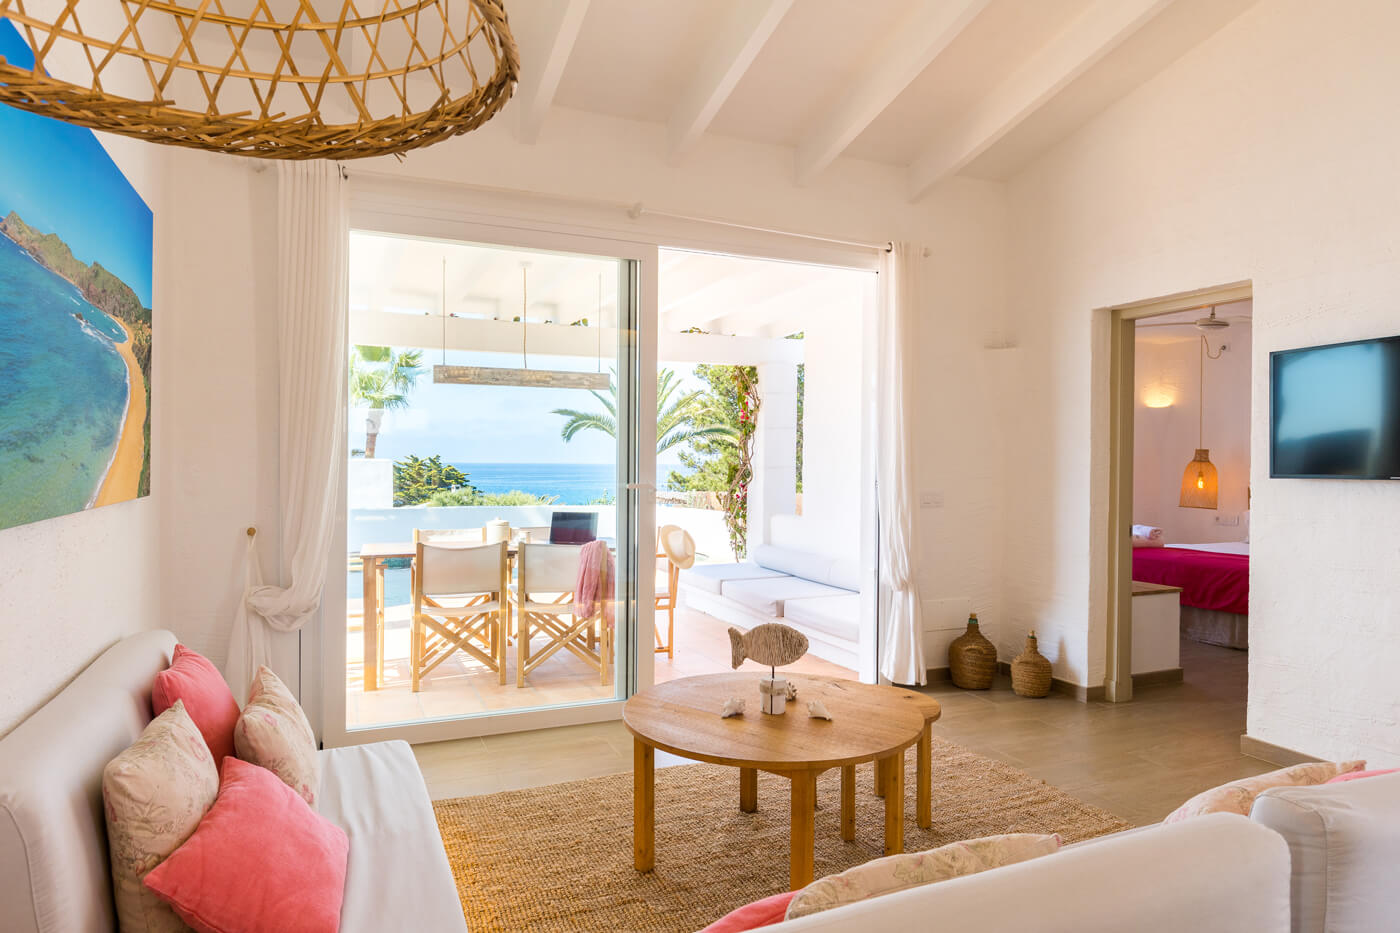 Villas Etnia Menorca - living room